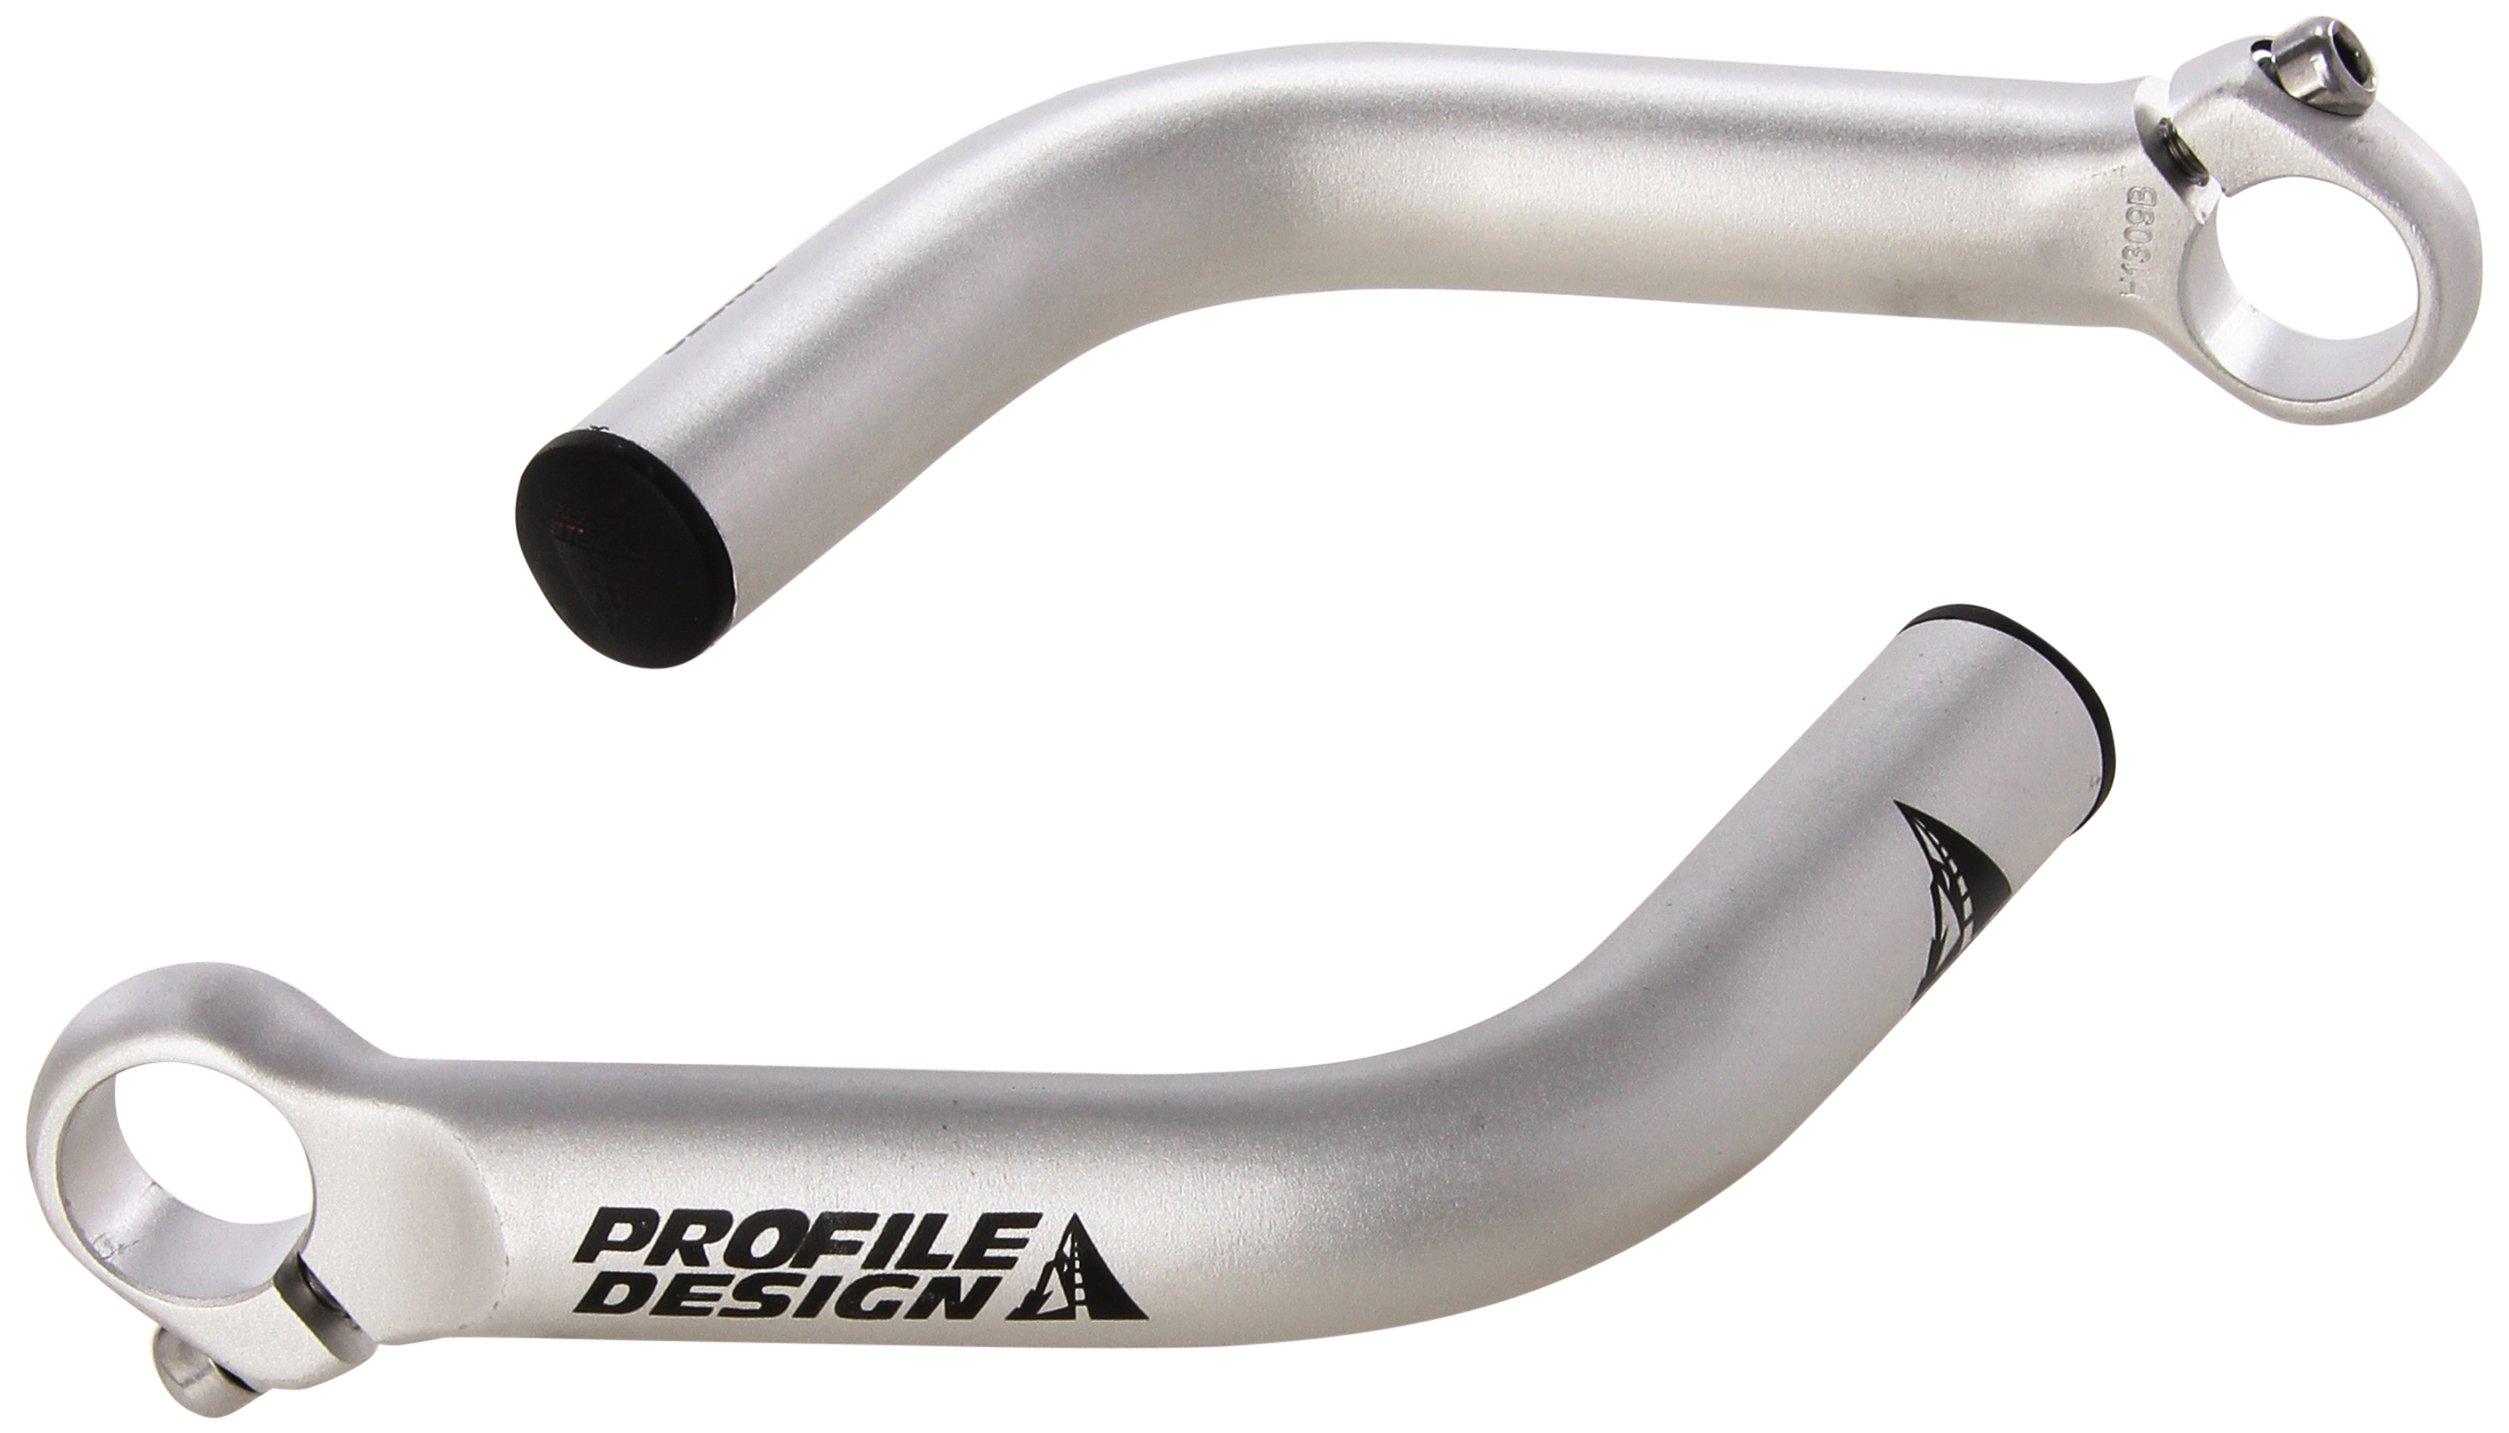 Profile Designs Boxer Bar End (Silver) by Profile Designs